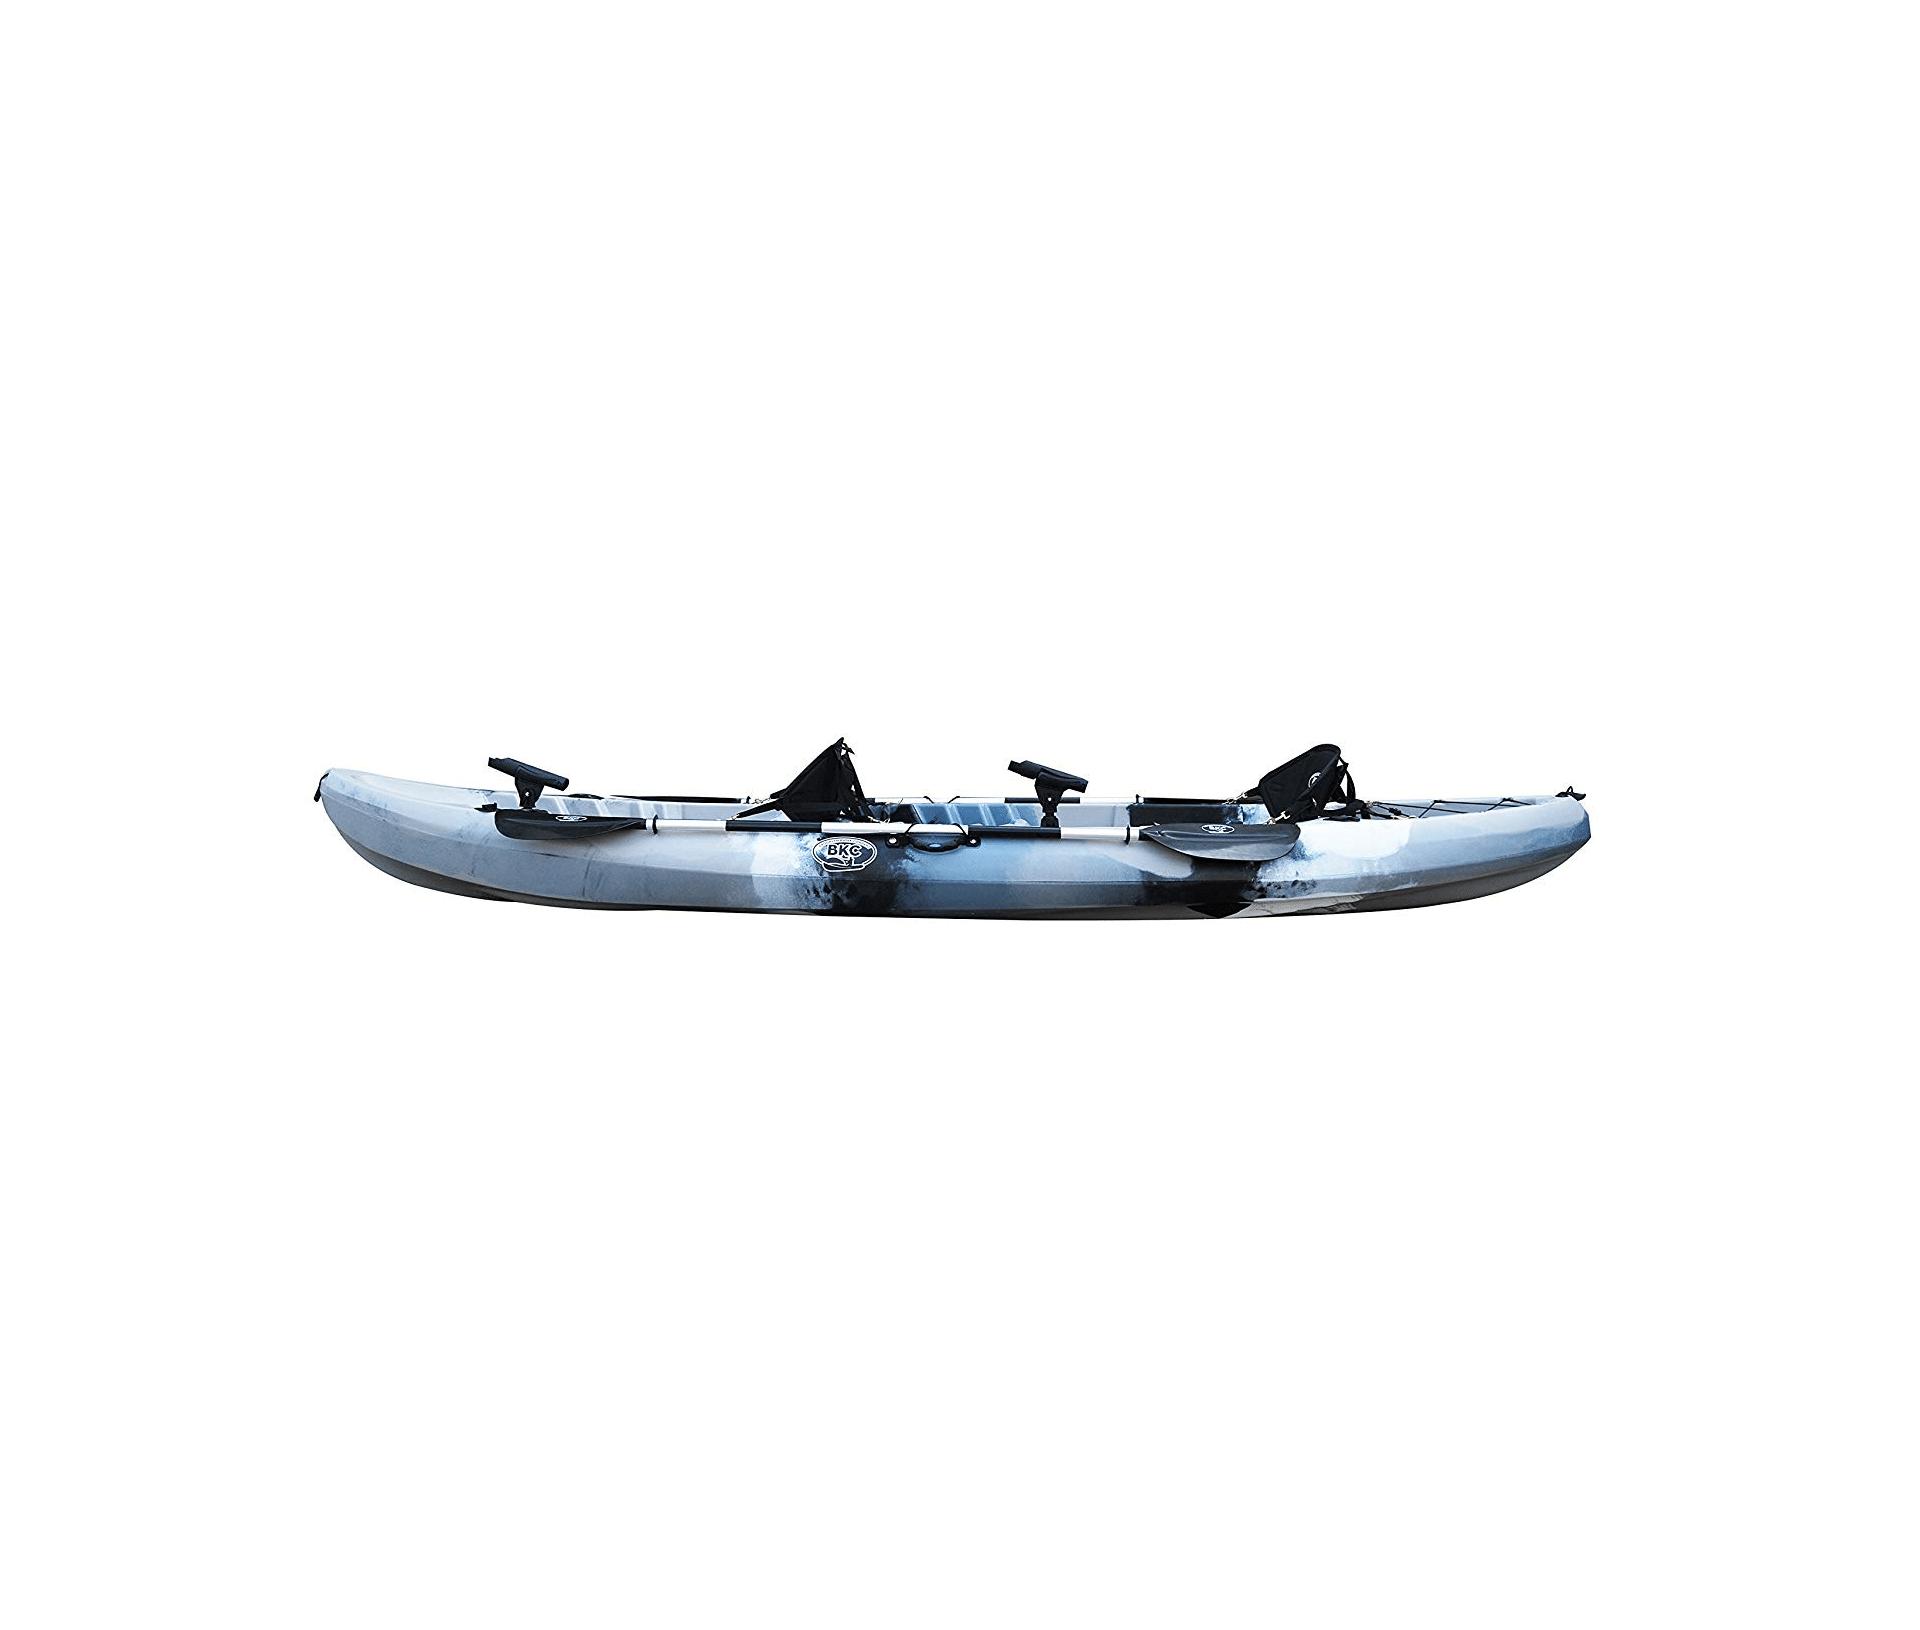 Brooklyn Kayak Company UH-TK219 12-Foot Kayak